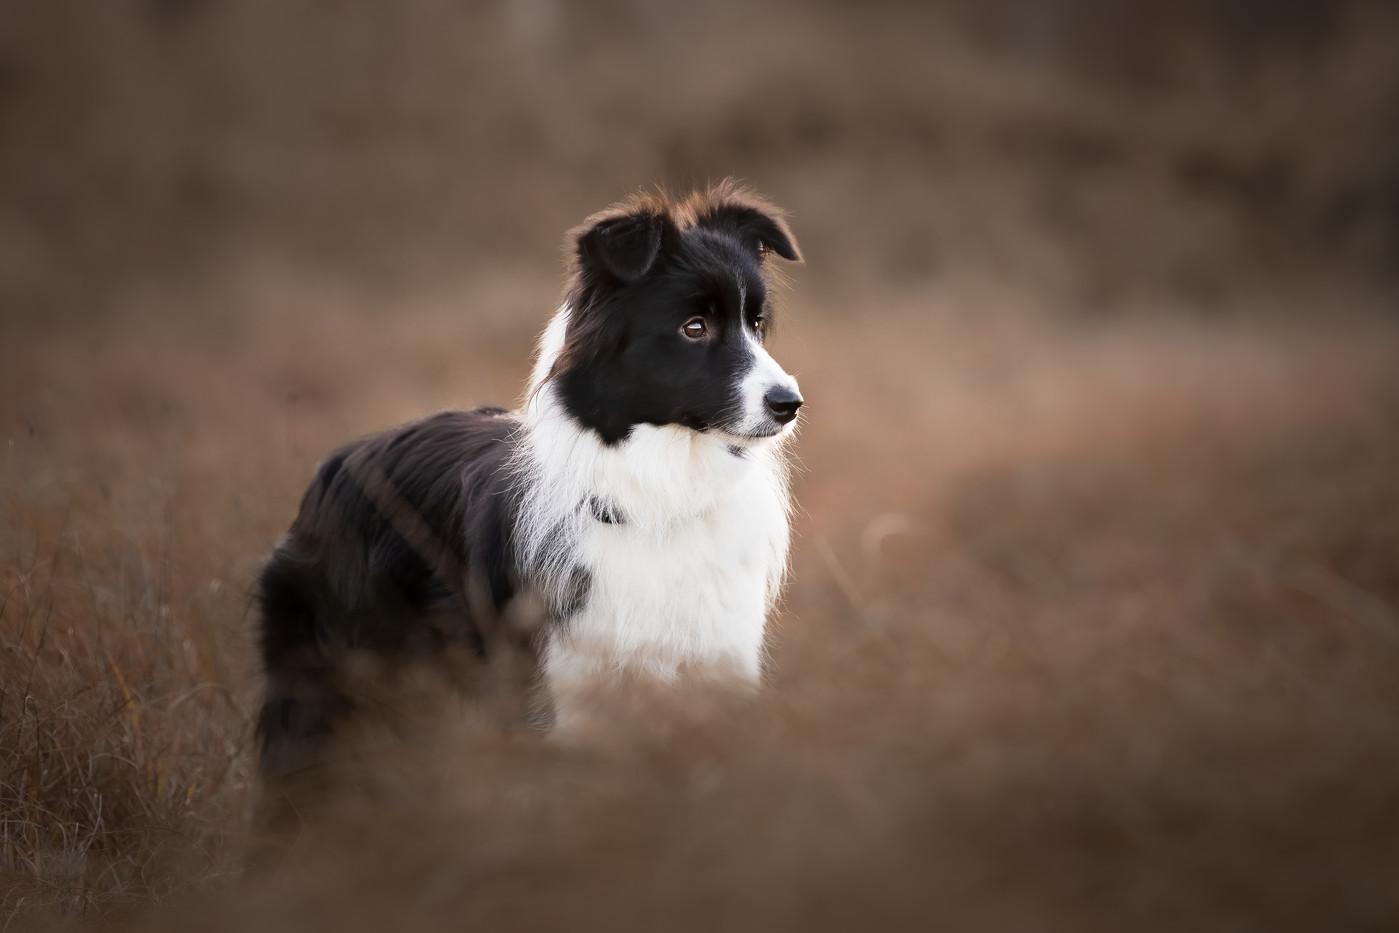 norfolk-dog-photographer-1T8A6256-Edit-2